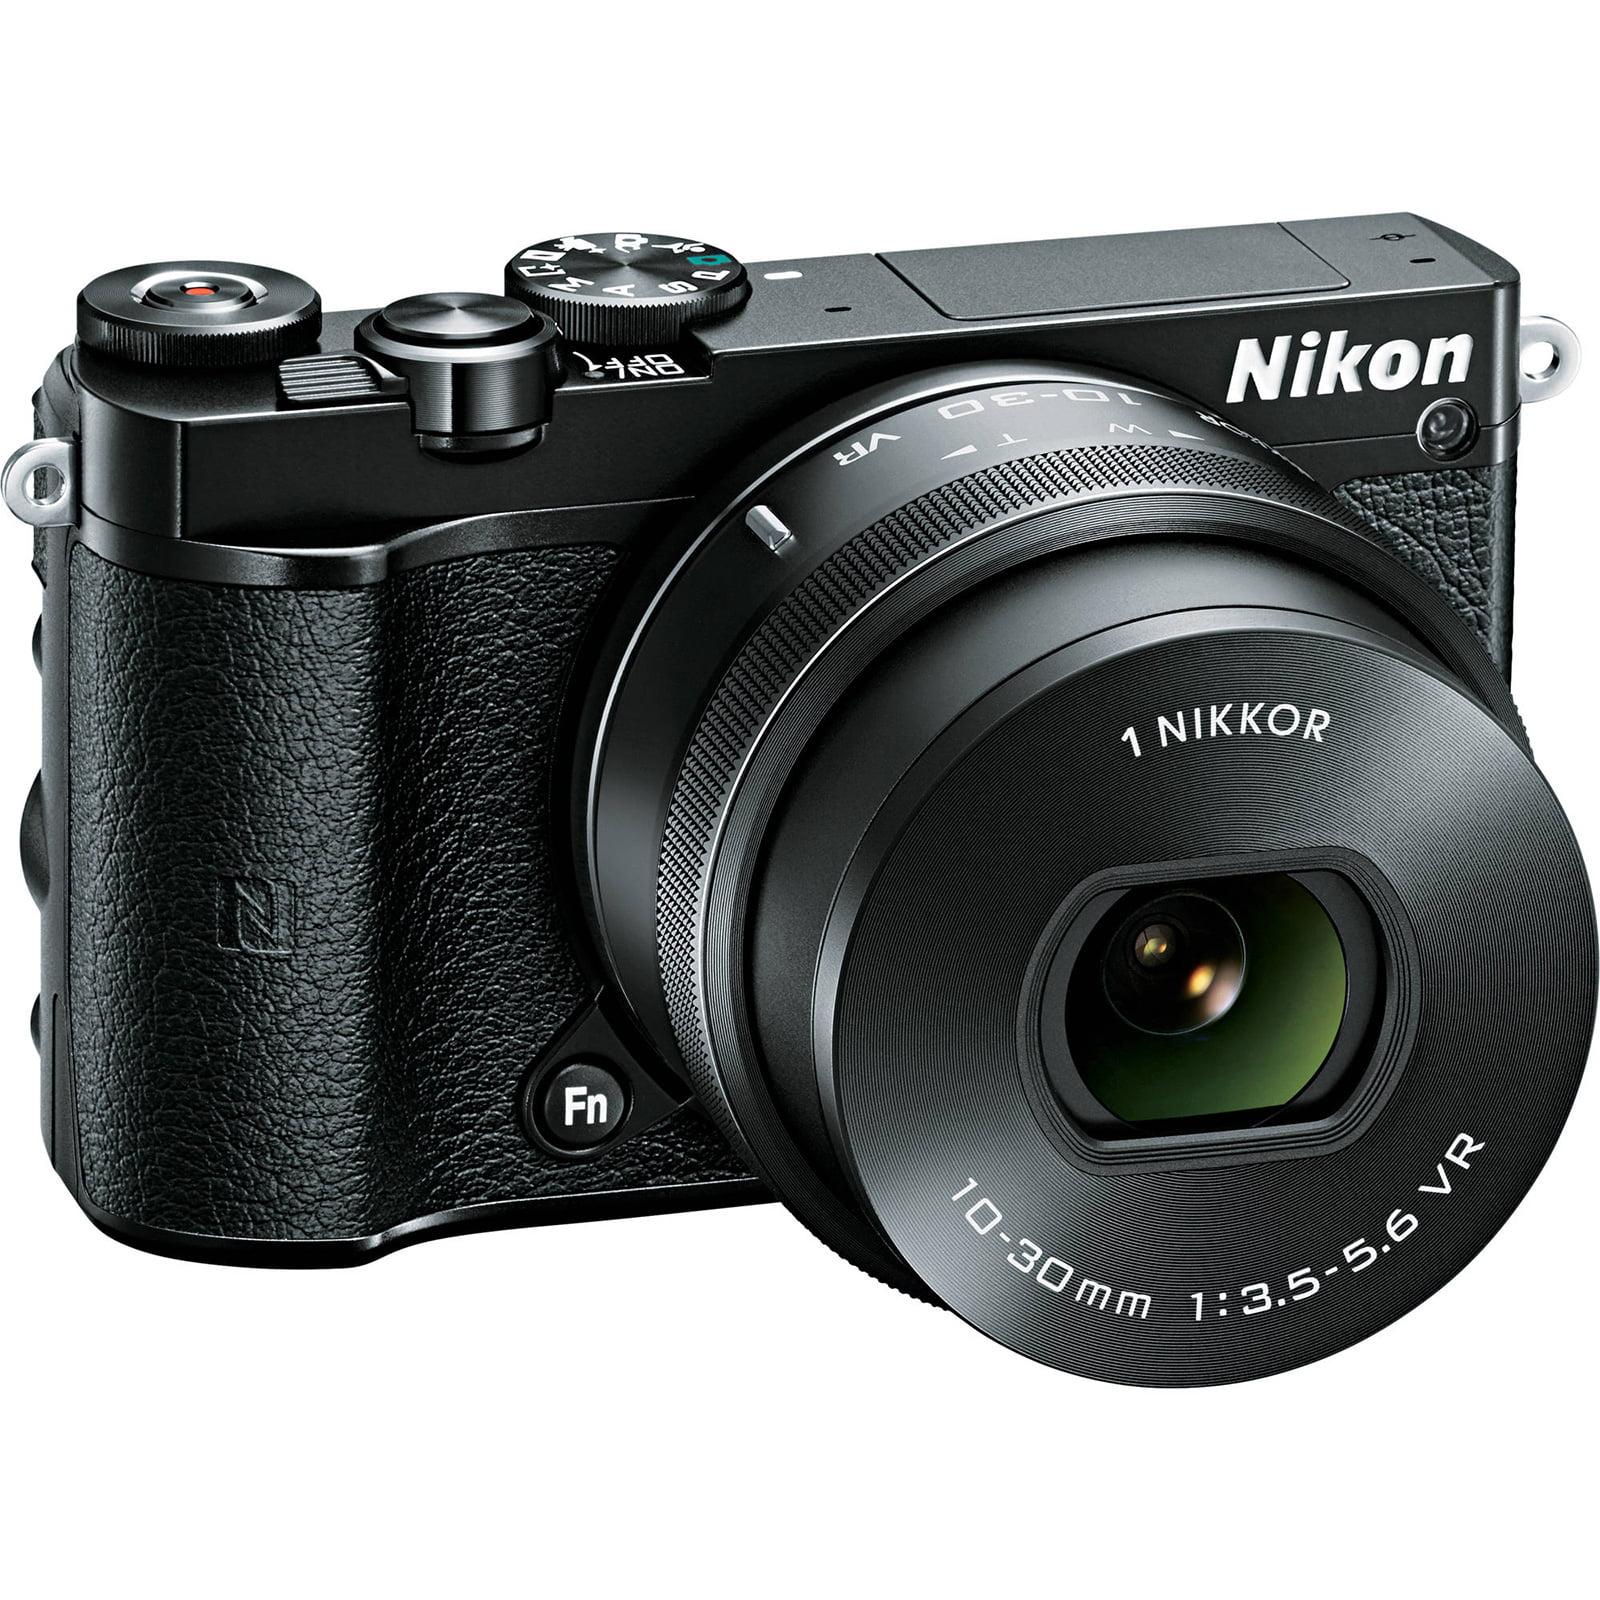 Nikon 1 J5 Wi-Fi Digital Camera & 10-30mm Lens (Black)